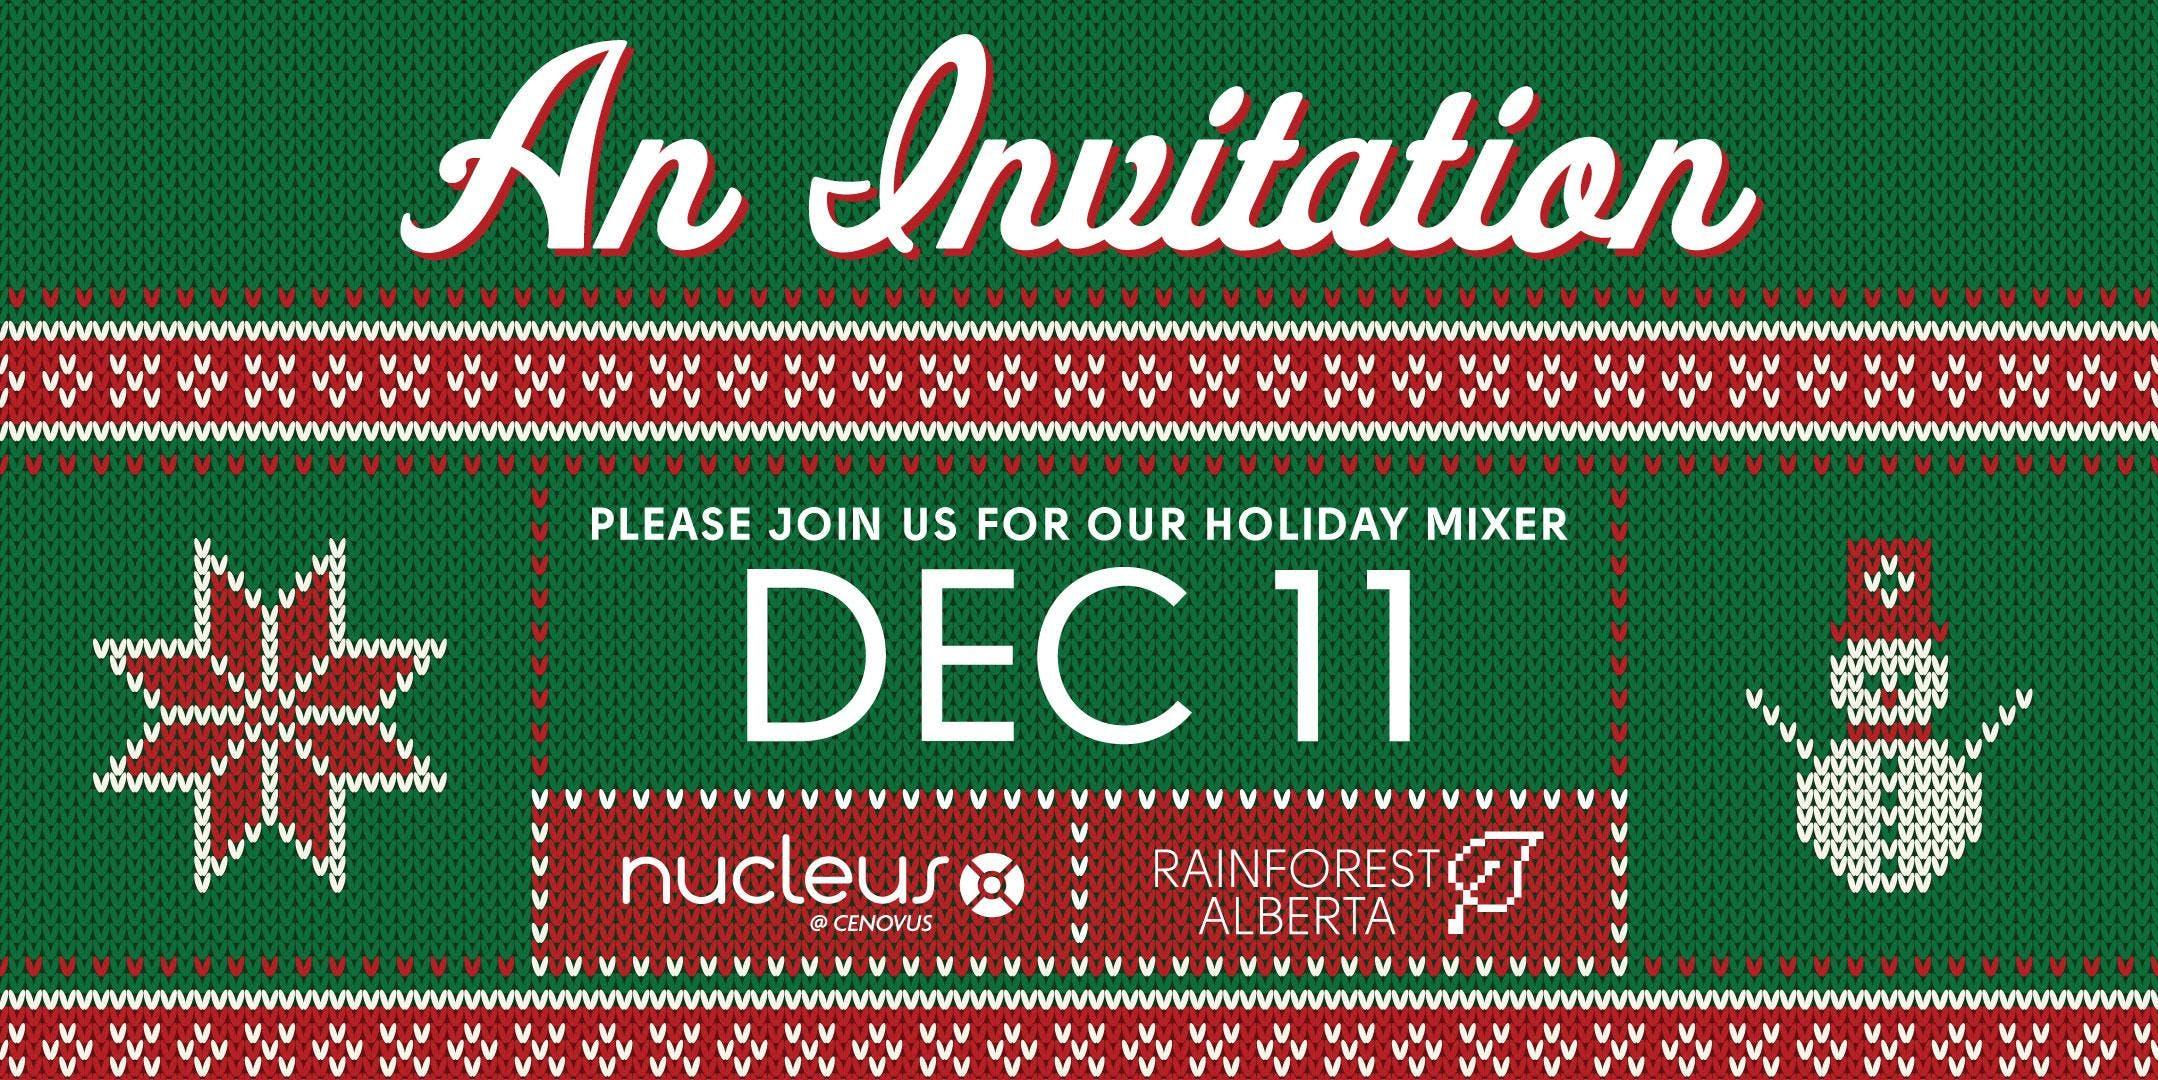 Nucleus & Rainforest AB Holiday Mixer